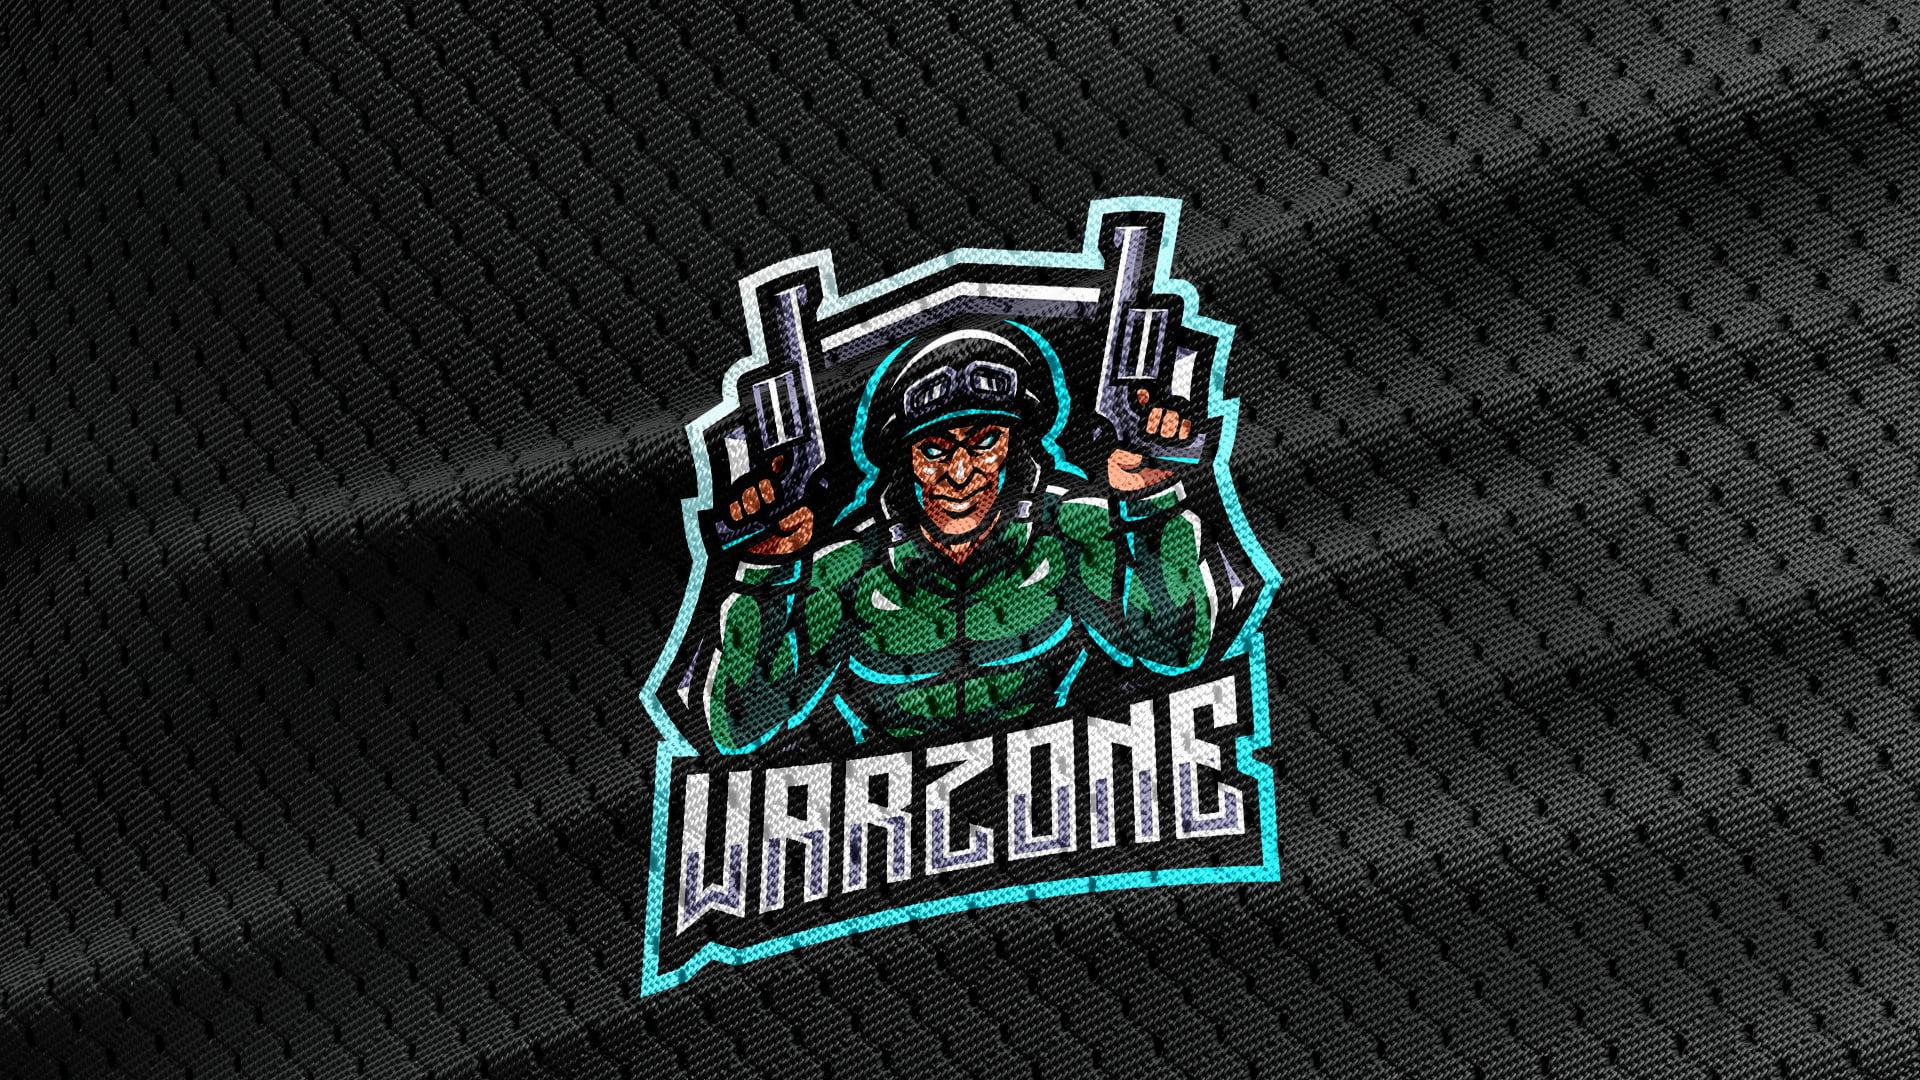 Black-Jersey-Texture-Free-Downloads-Warzone-Gaming-Mascot-Logo